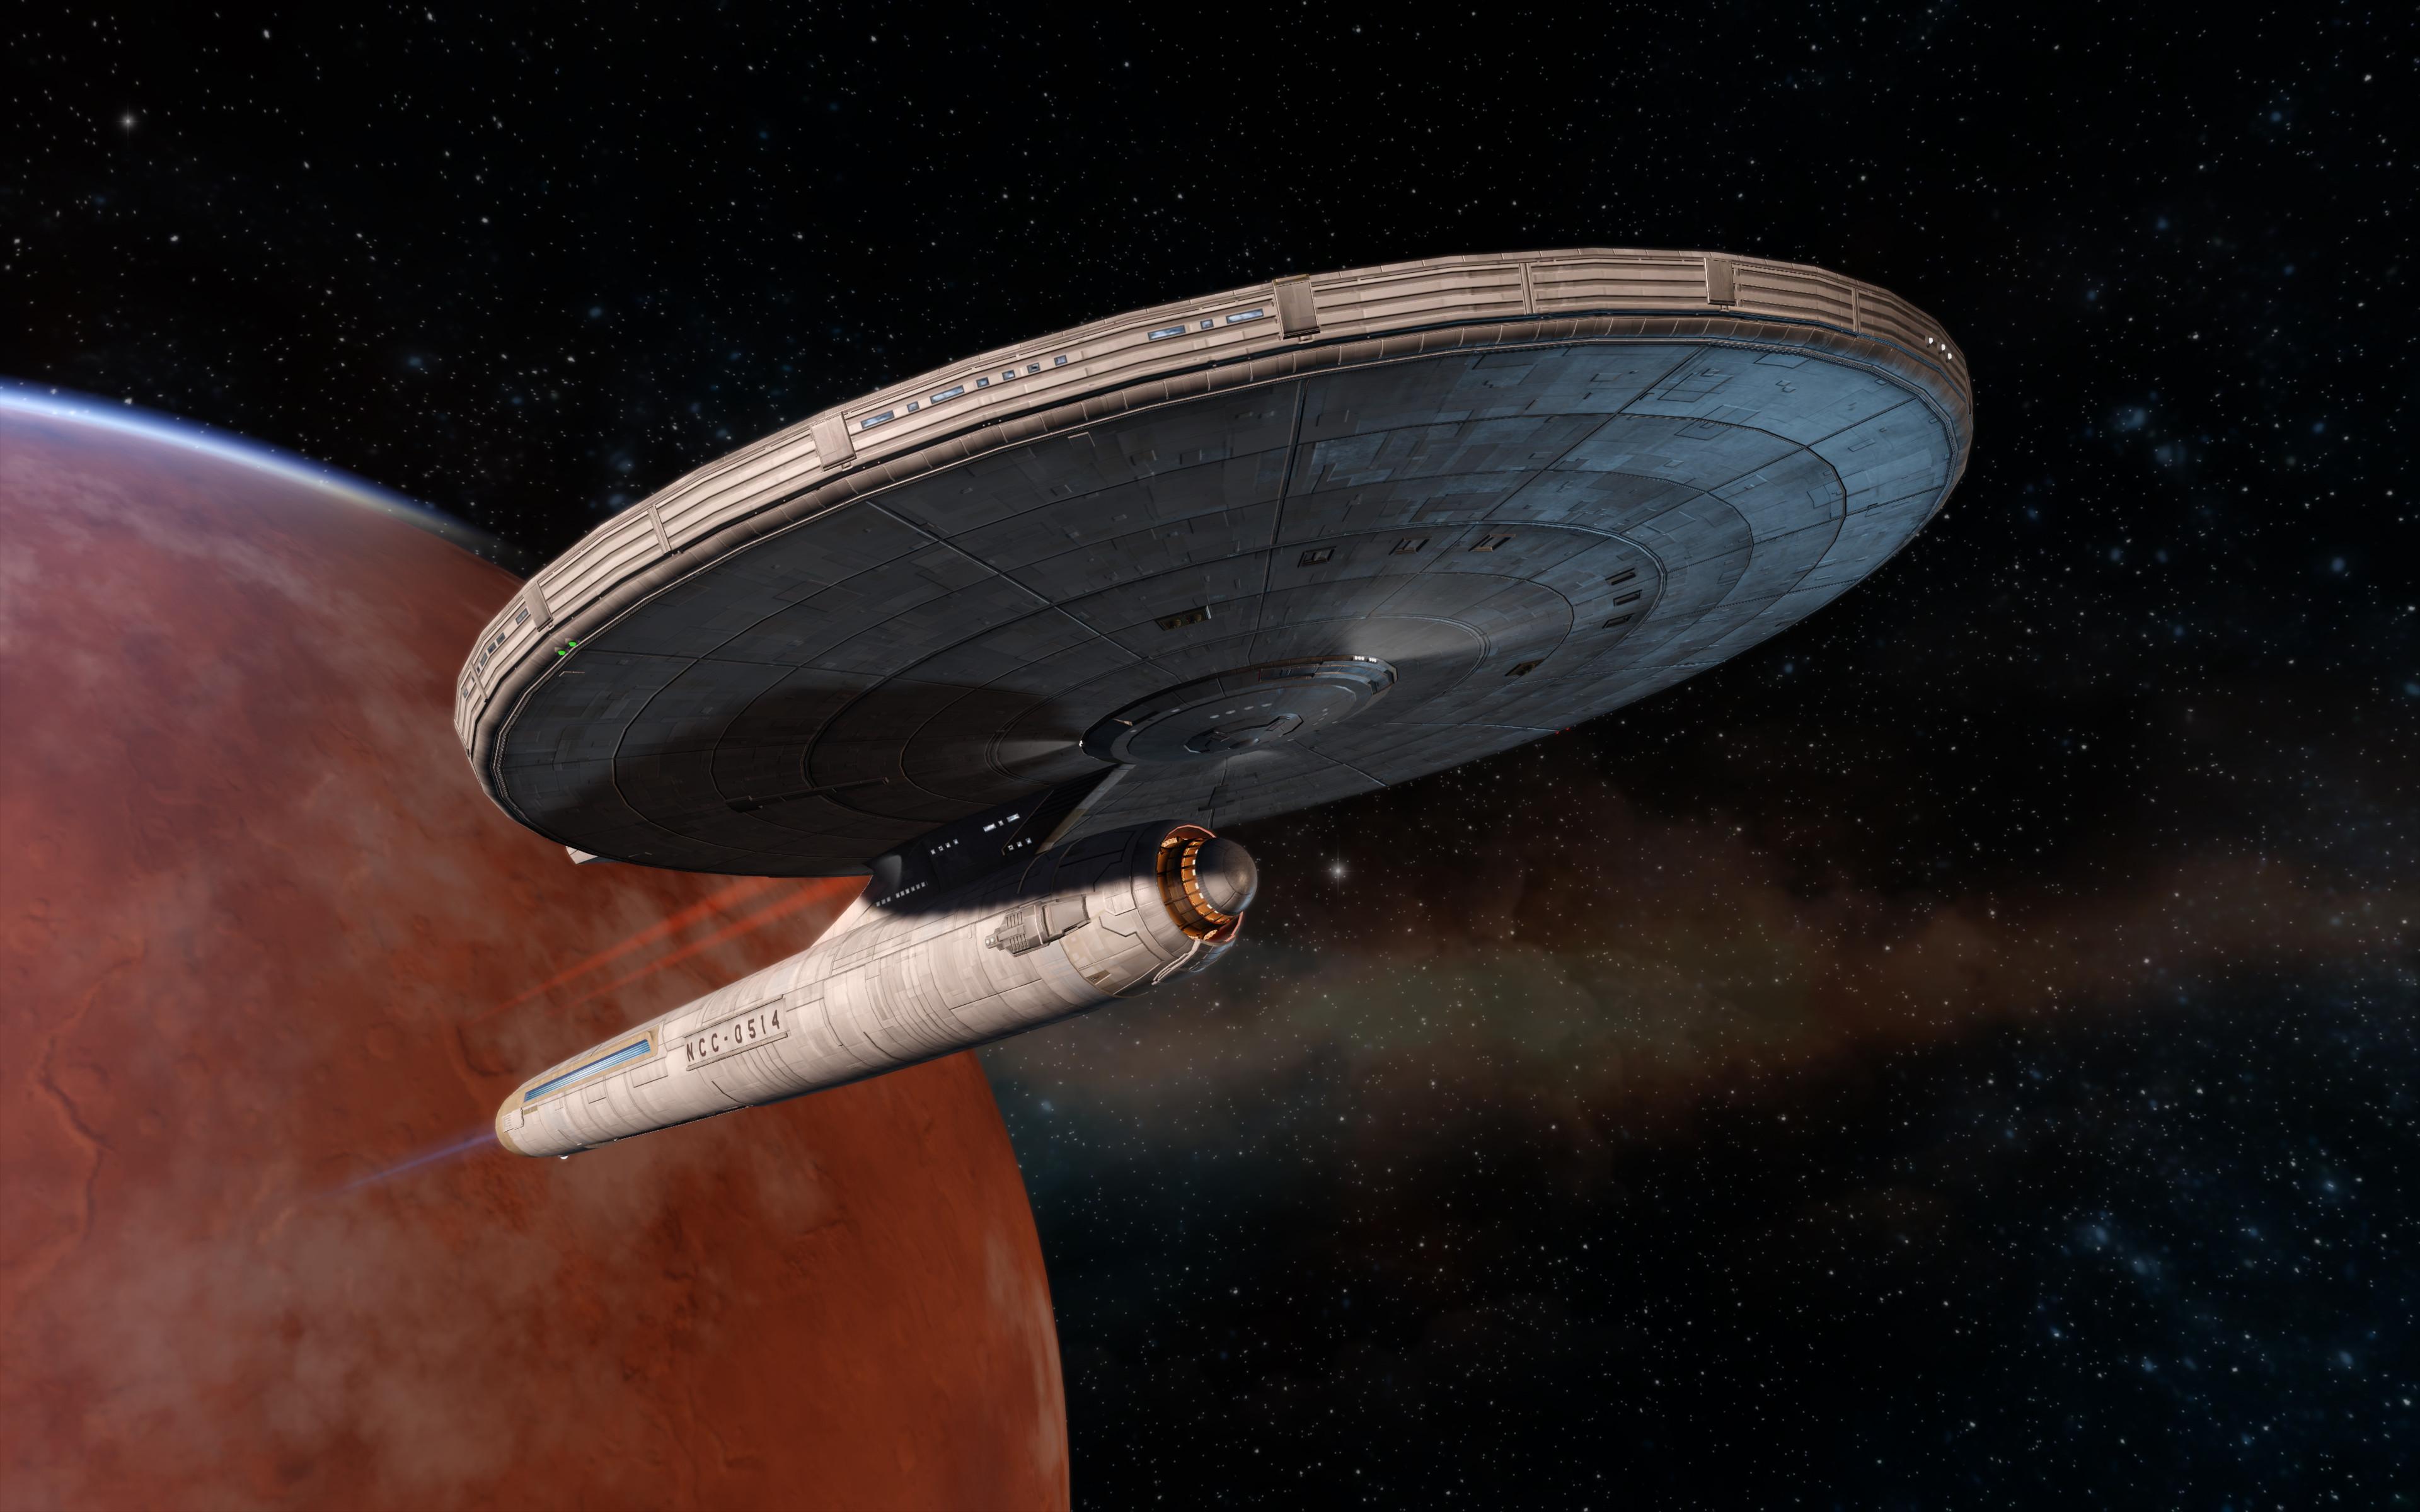 Star Trek Online in-game screenshot - Model by Tobias Richter, material by Thomas Marrone